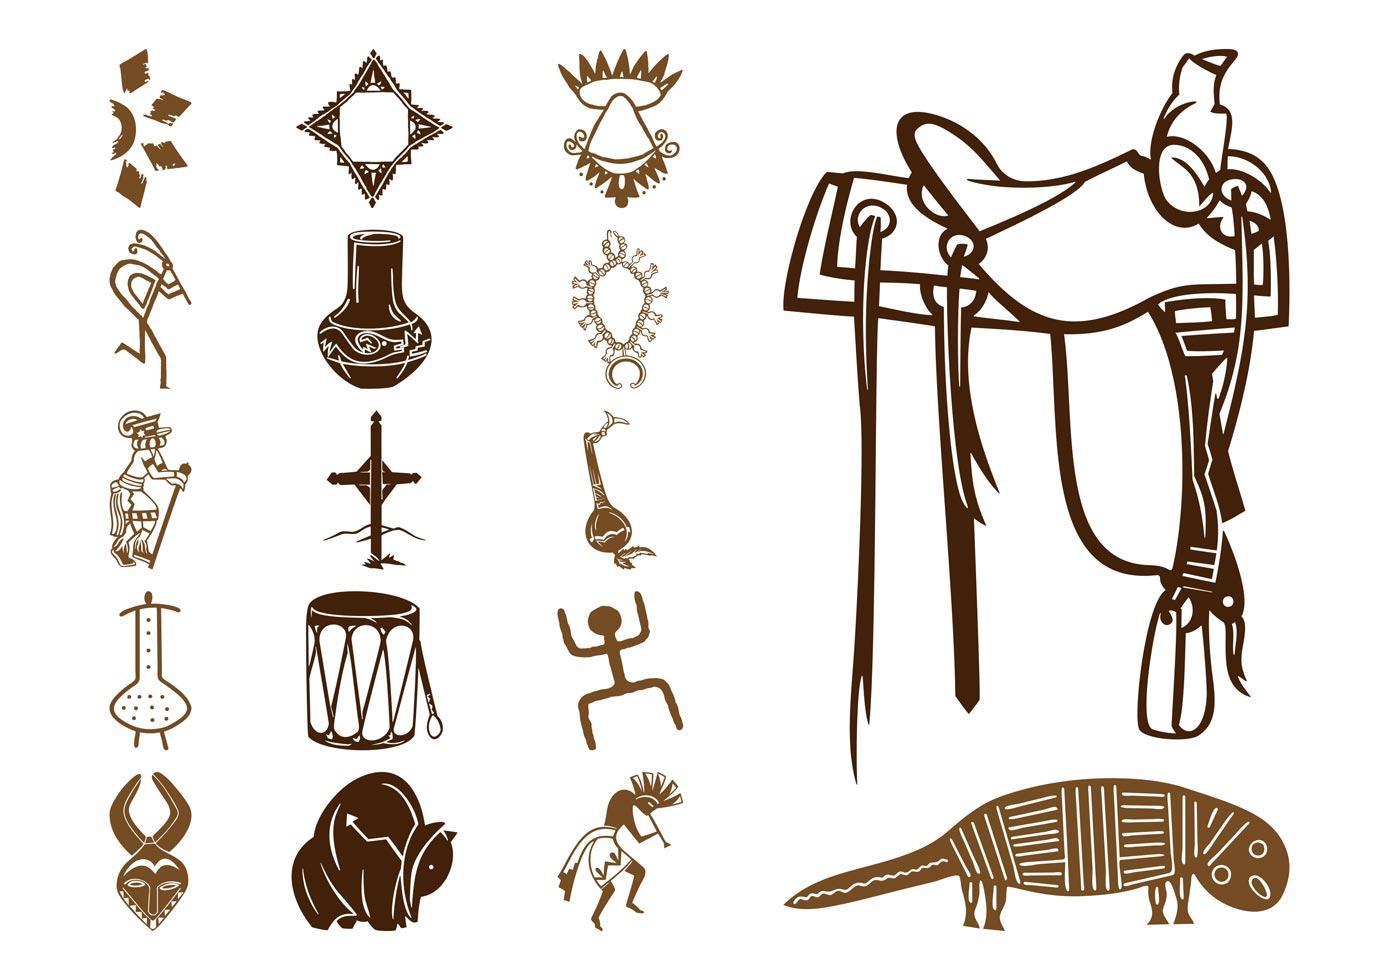 native american symbols thesymbolsnet - HD1400×980